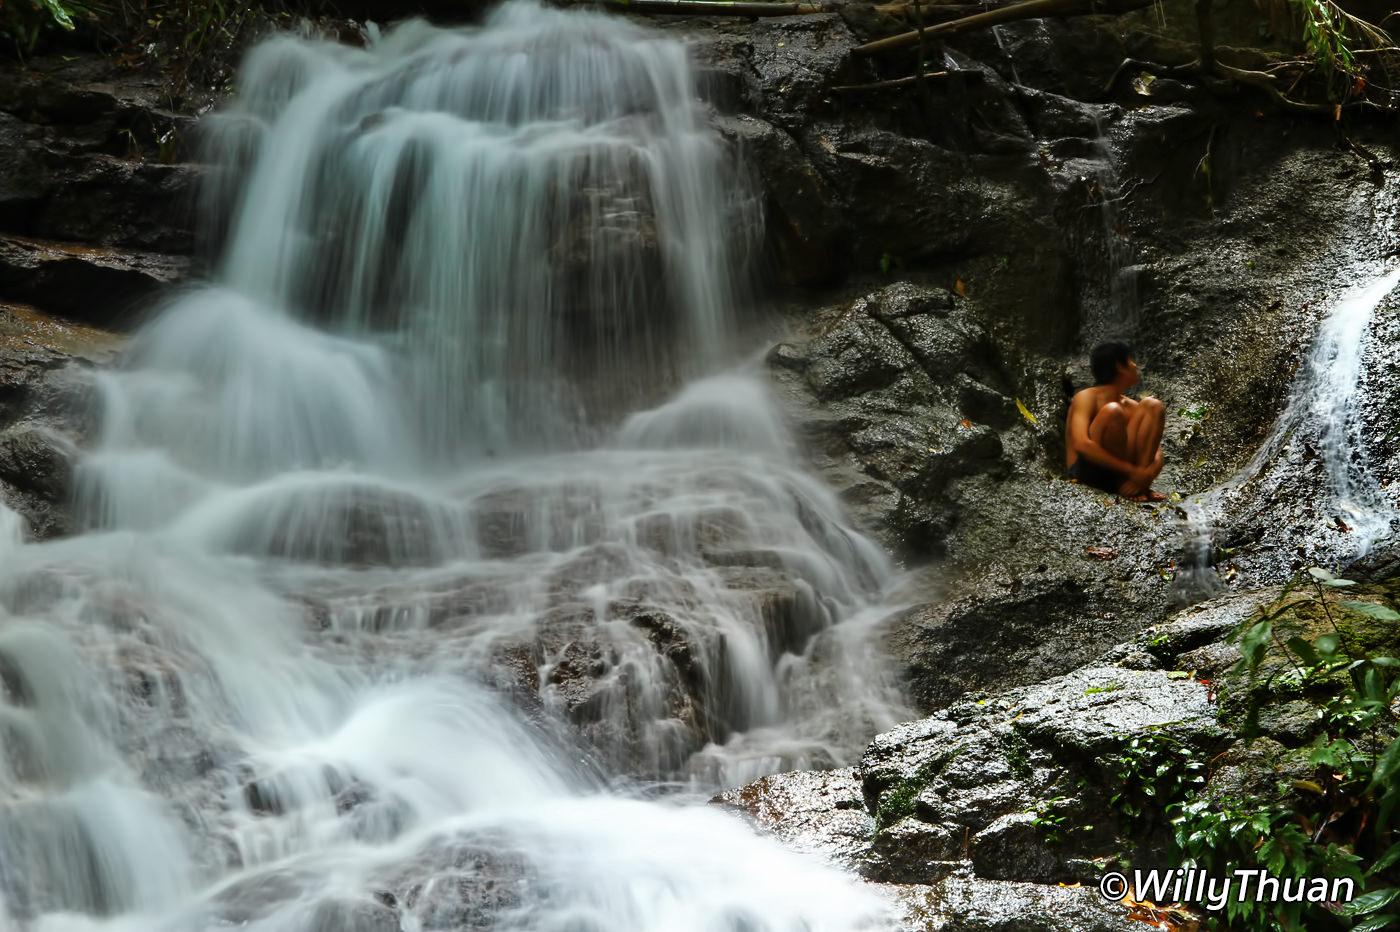 Phuket Waterfalls